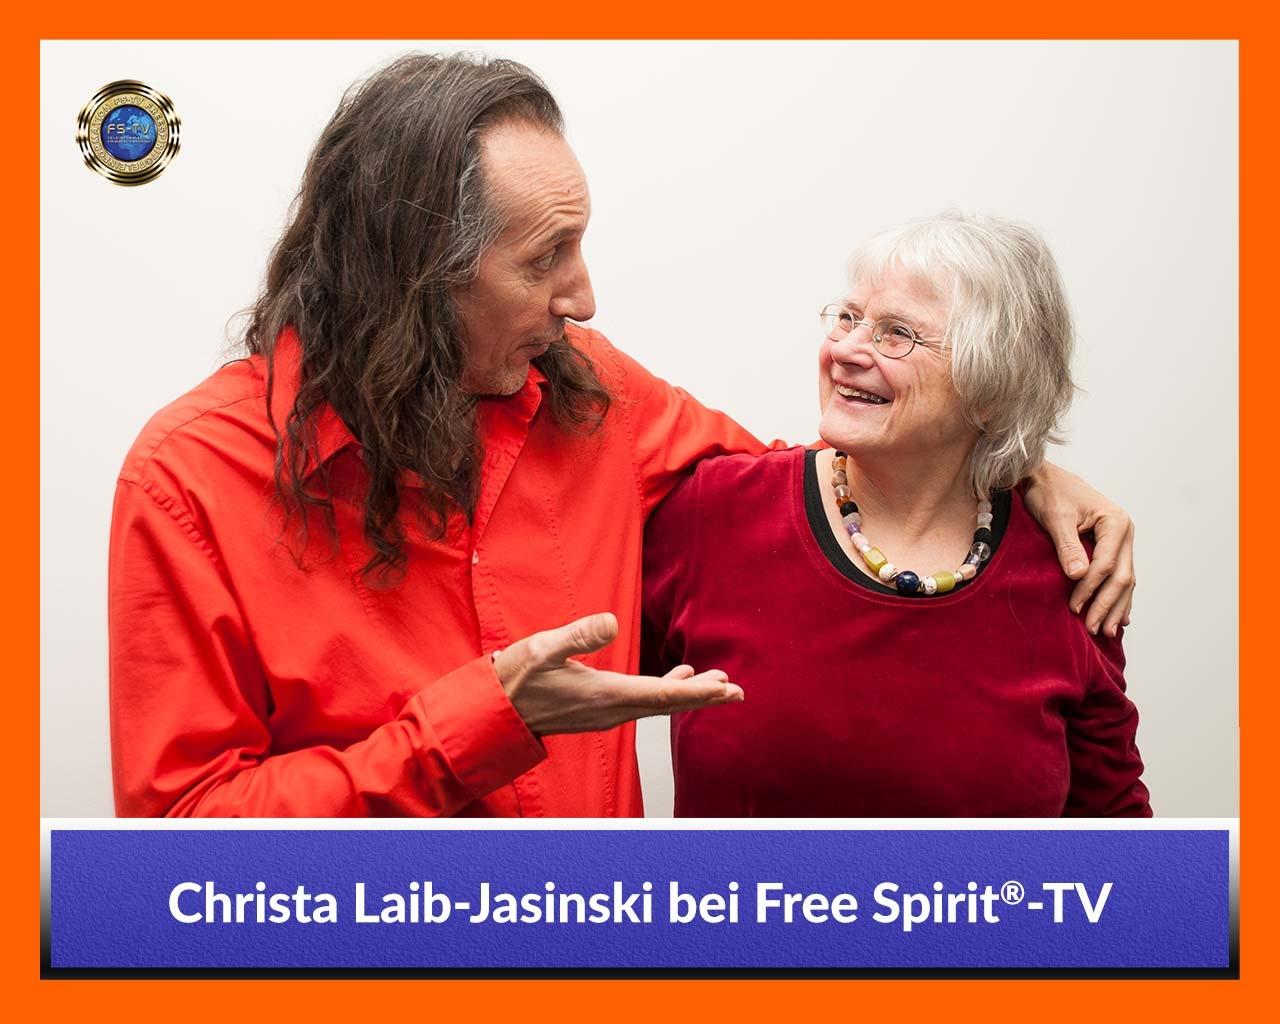 Christa-Laib-Jasinski-07